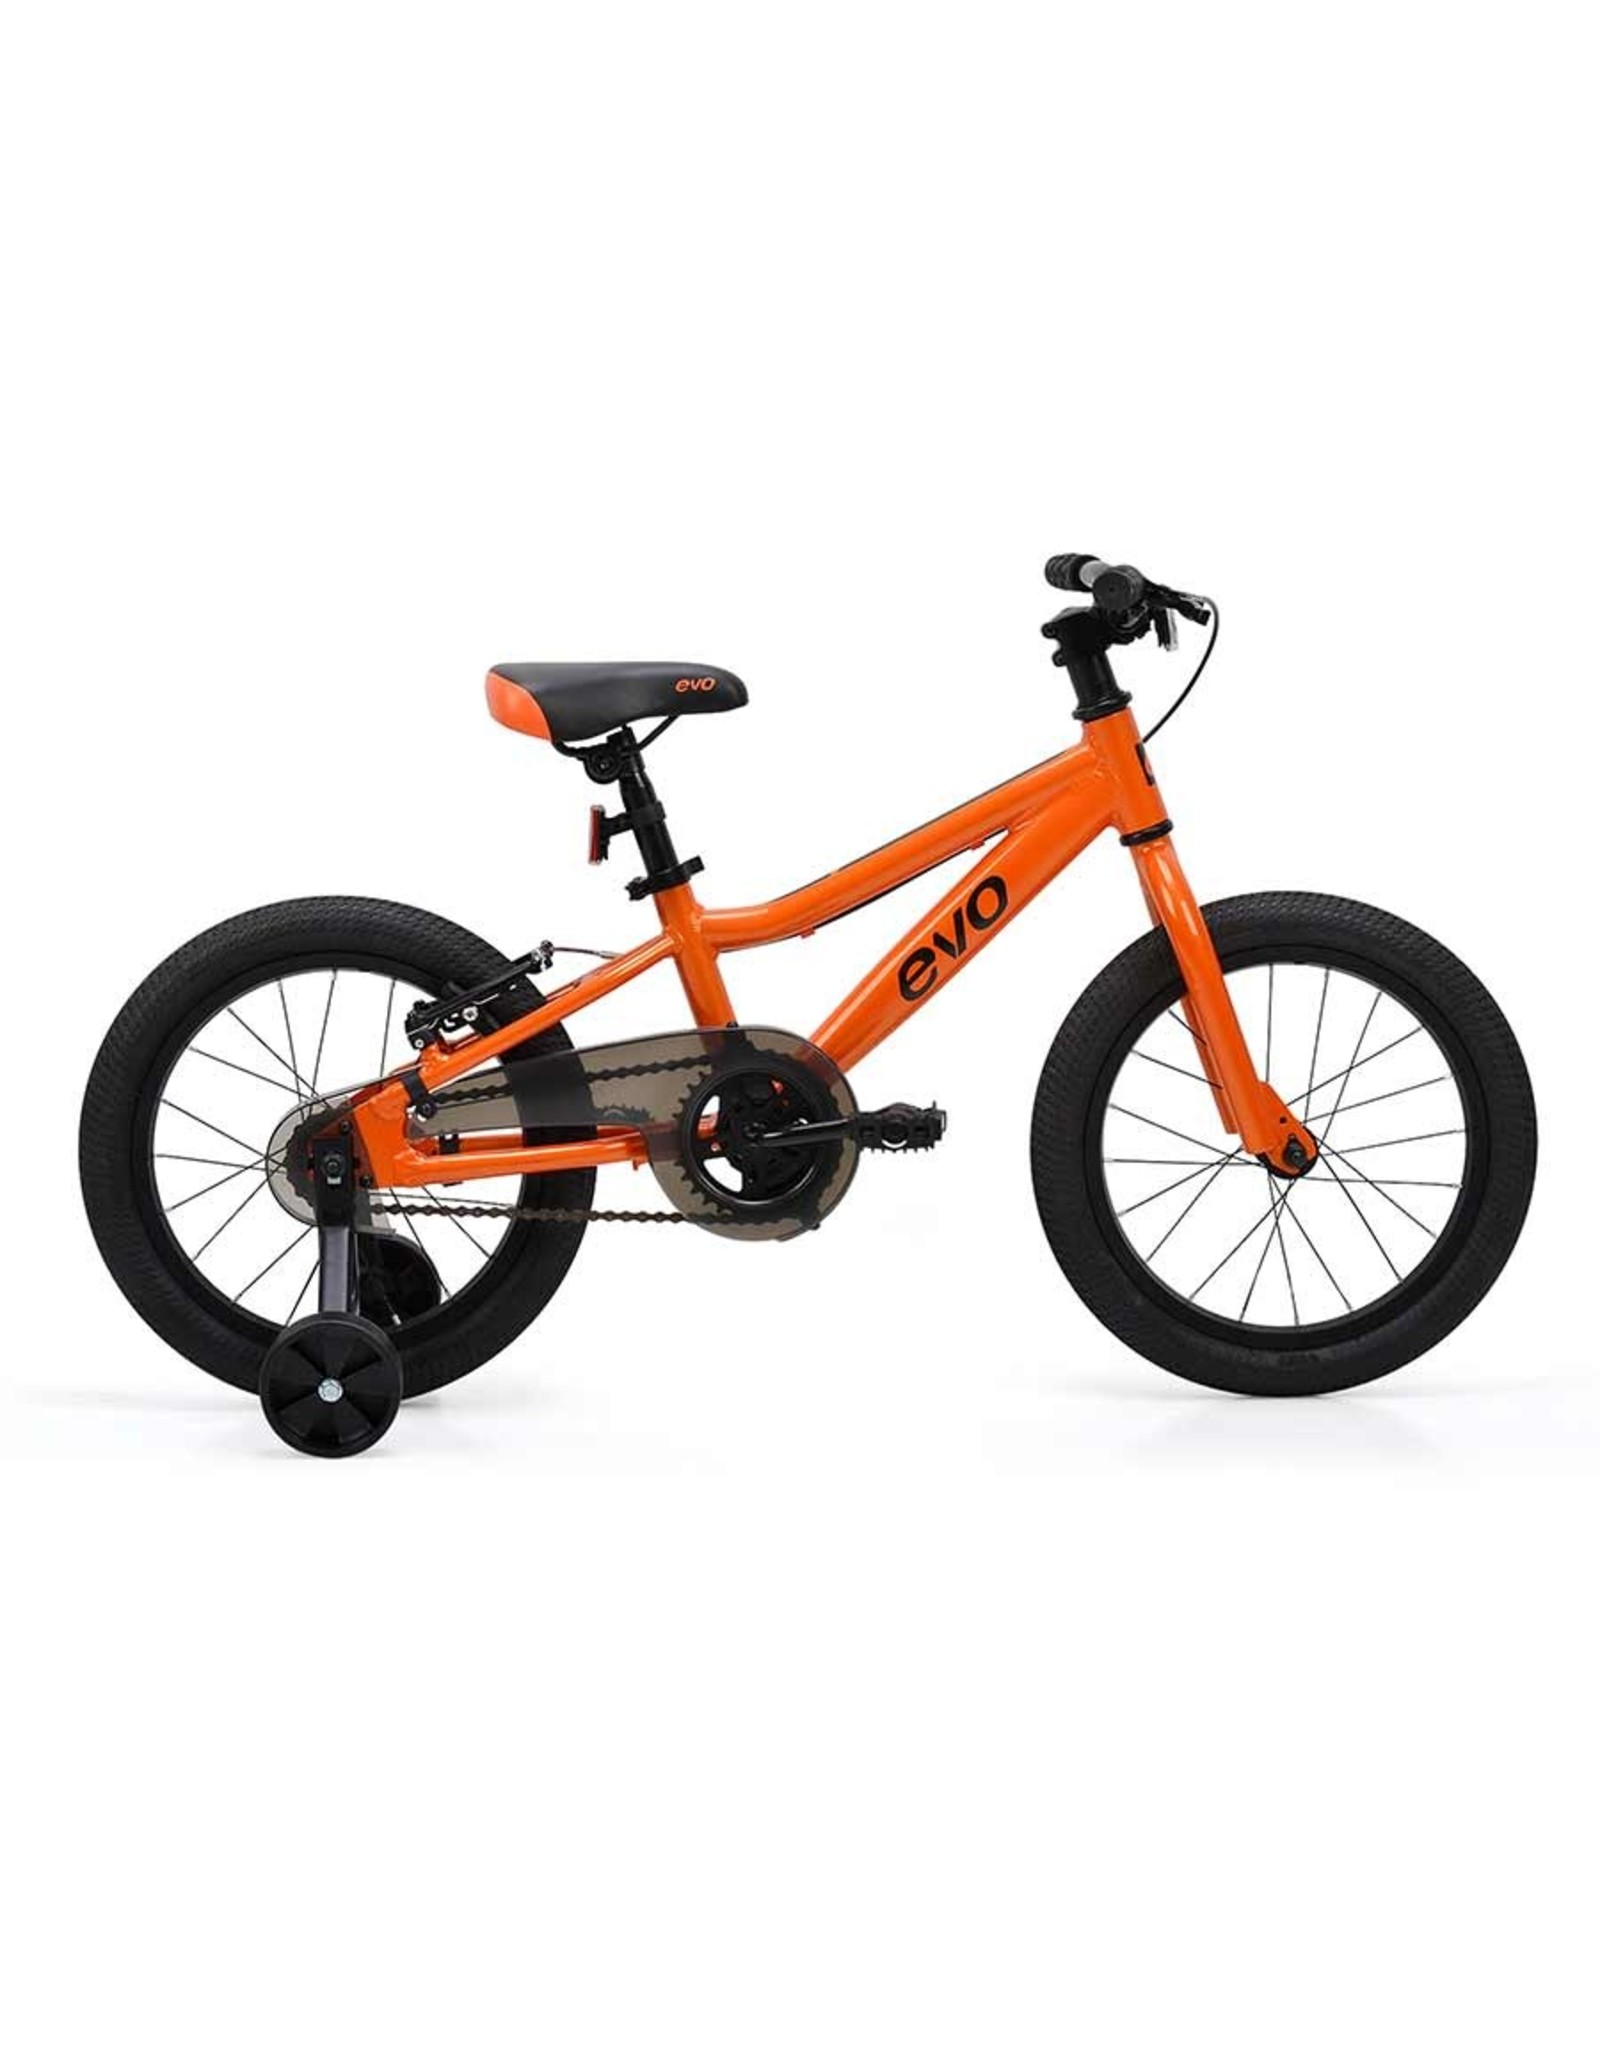 EVO EVO, Rock Ridge 16, Kids Bicycle, 16'', Orange, U